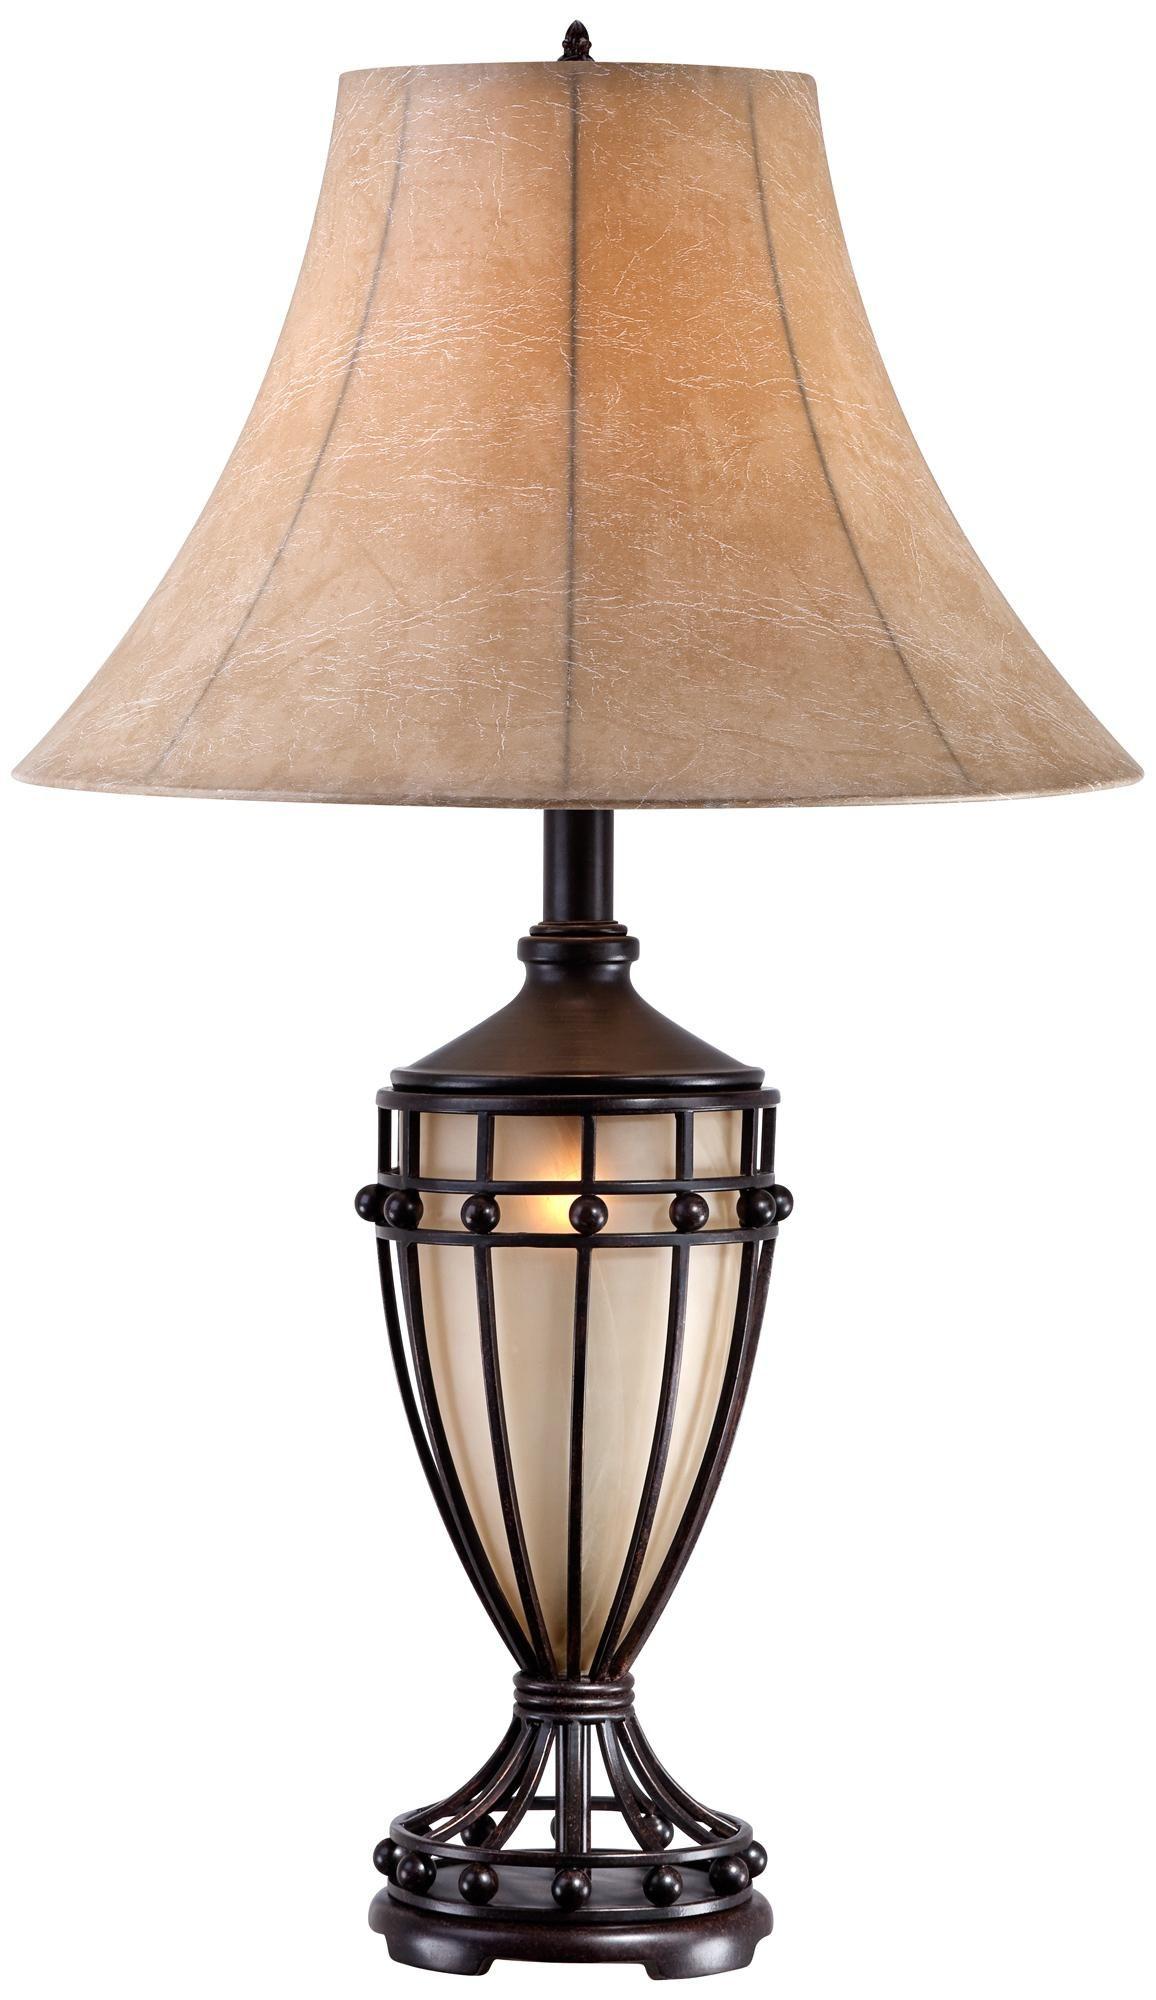 Cardiff Iron Night Light Urn Table Lamp T7663 Lamps Plus Table Lamp Lamp Lantern Table Lamp